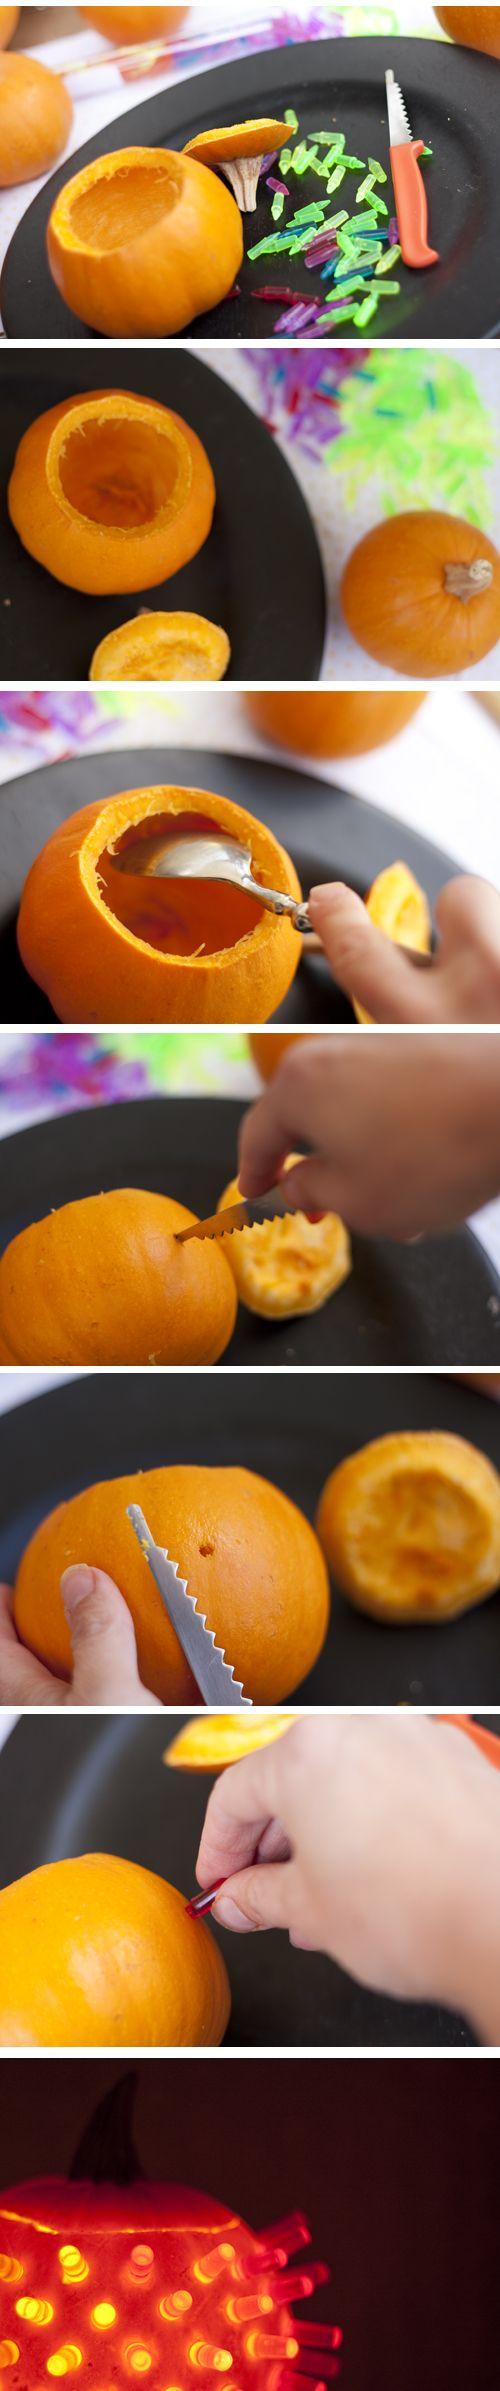 our latest pumpkin carving idea